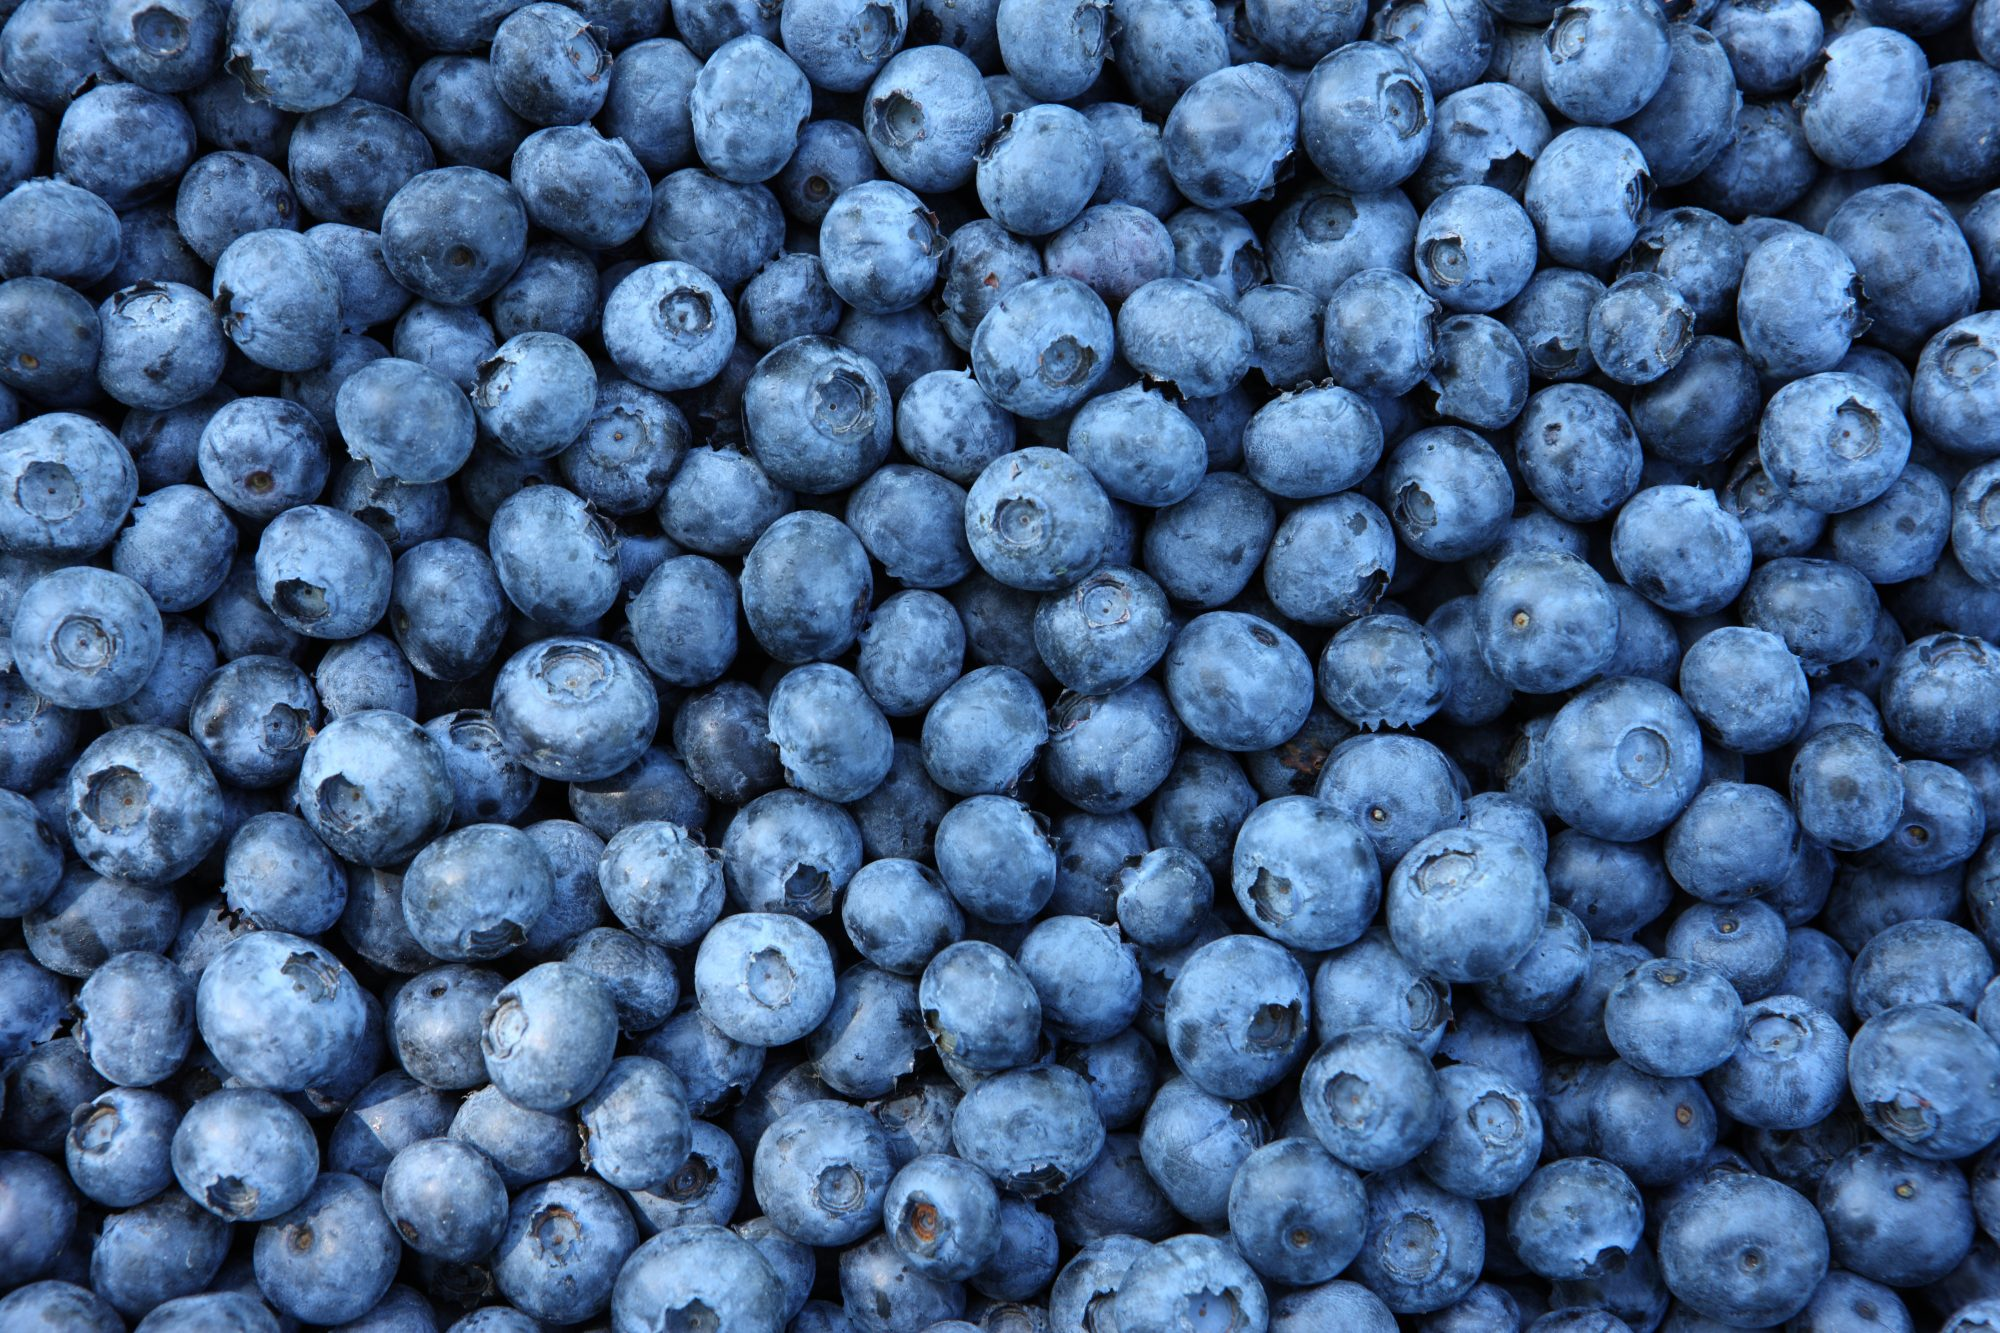 Blueberry Getty 8/10/20